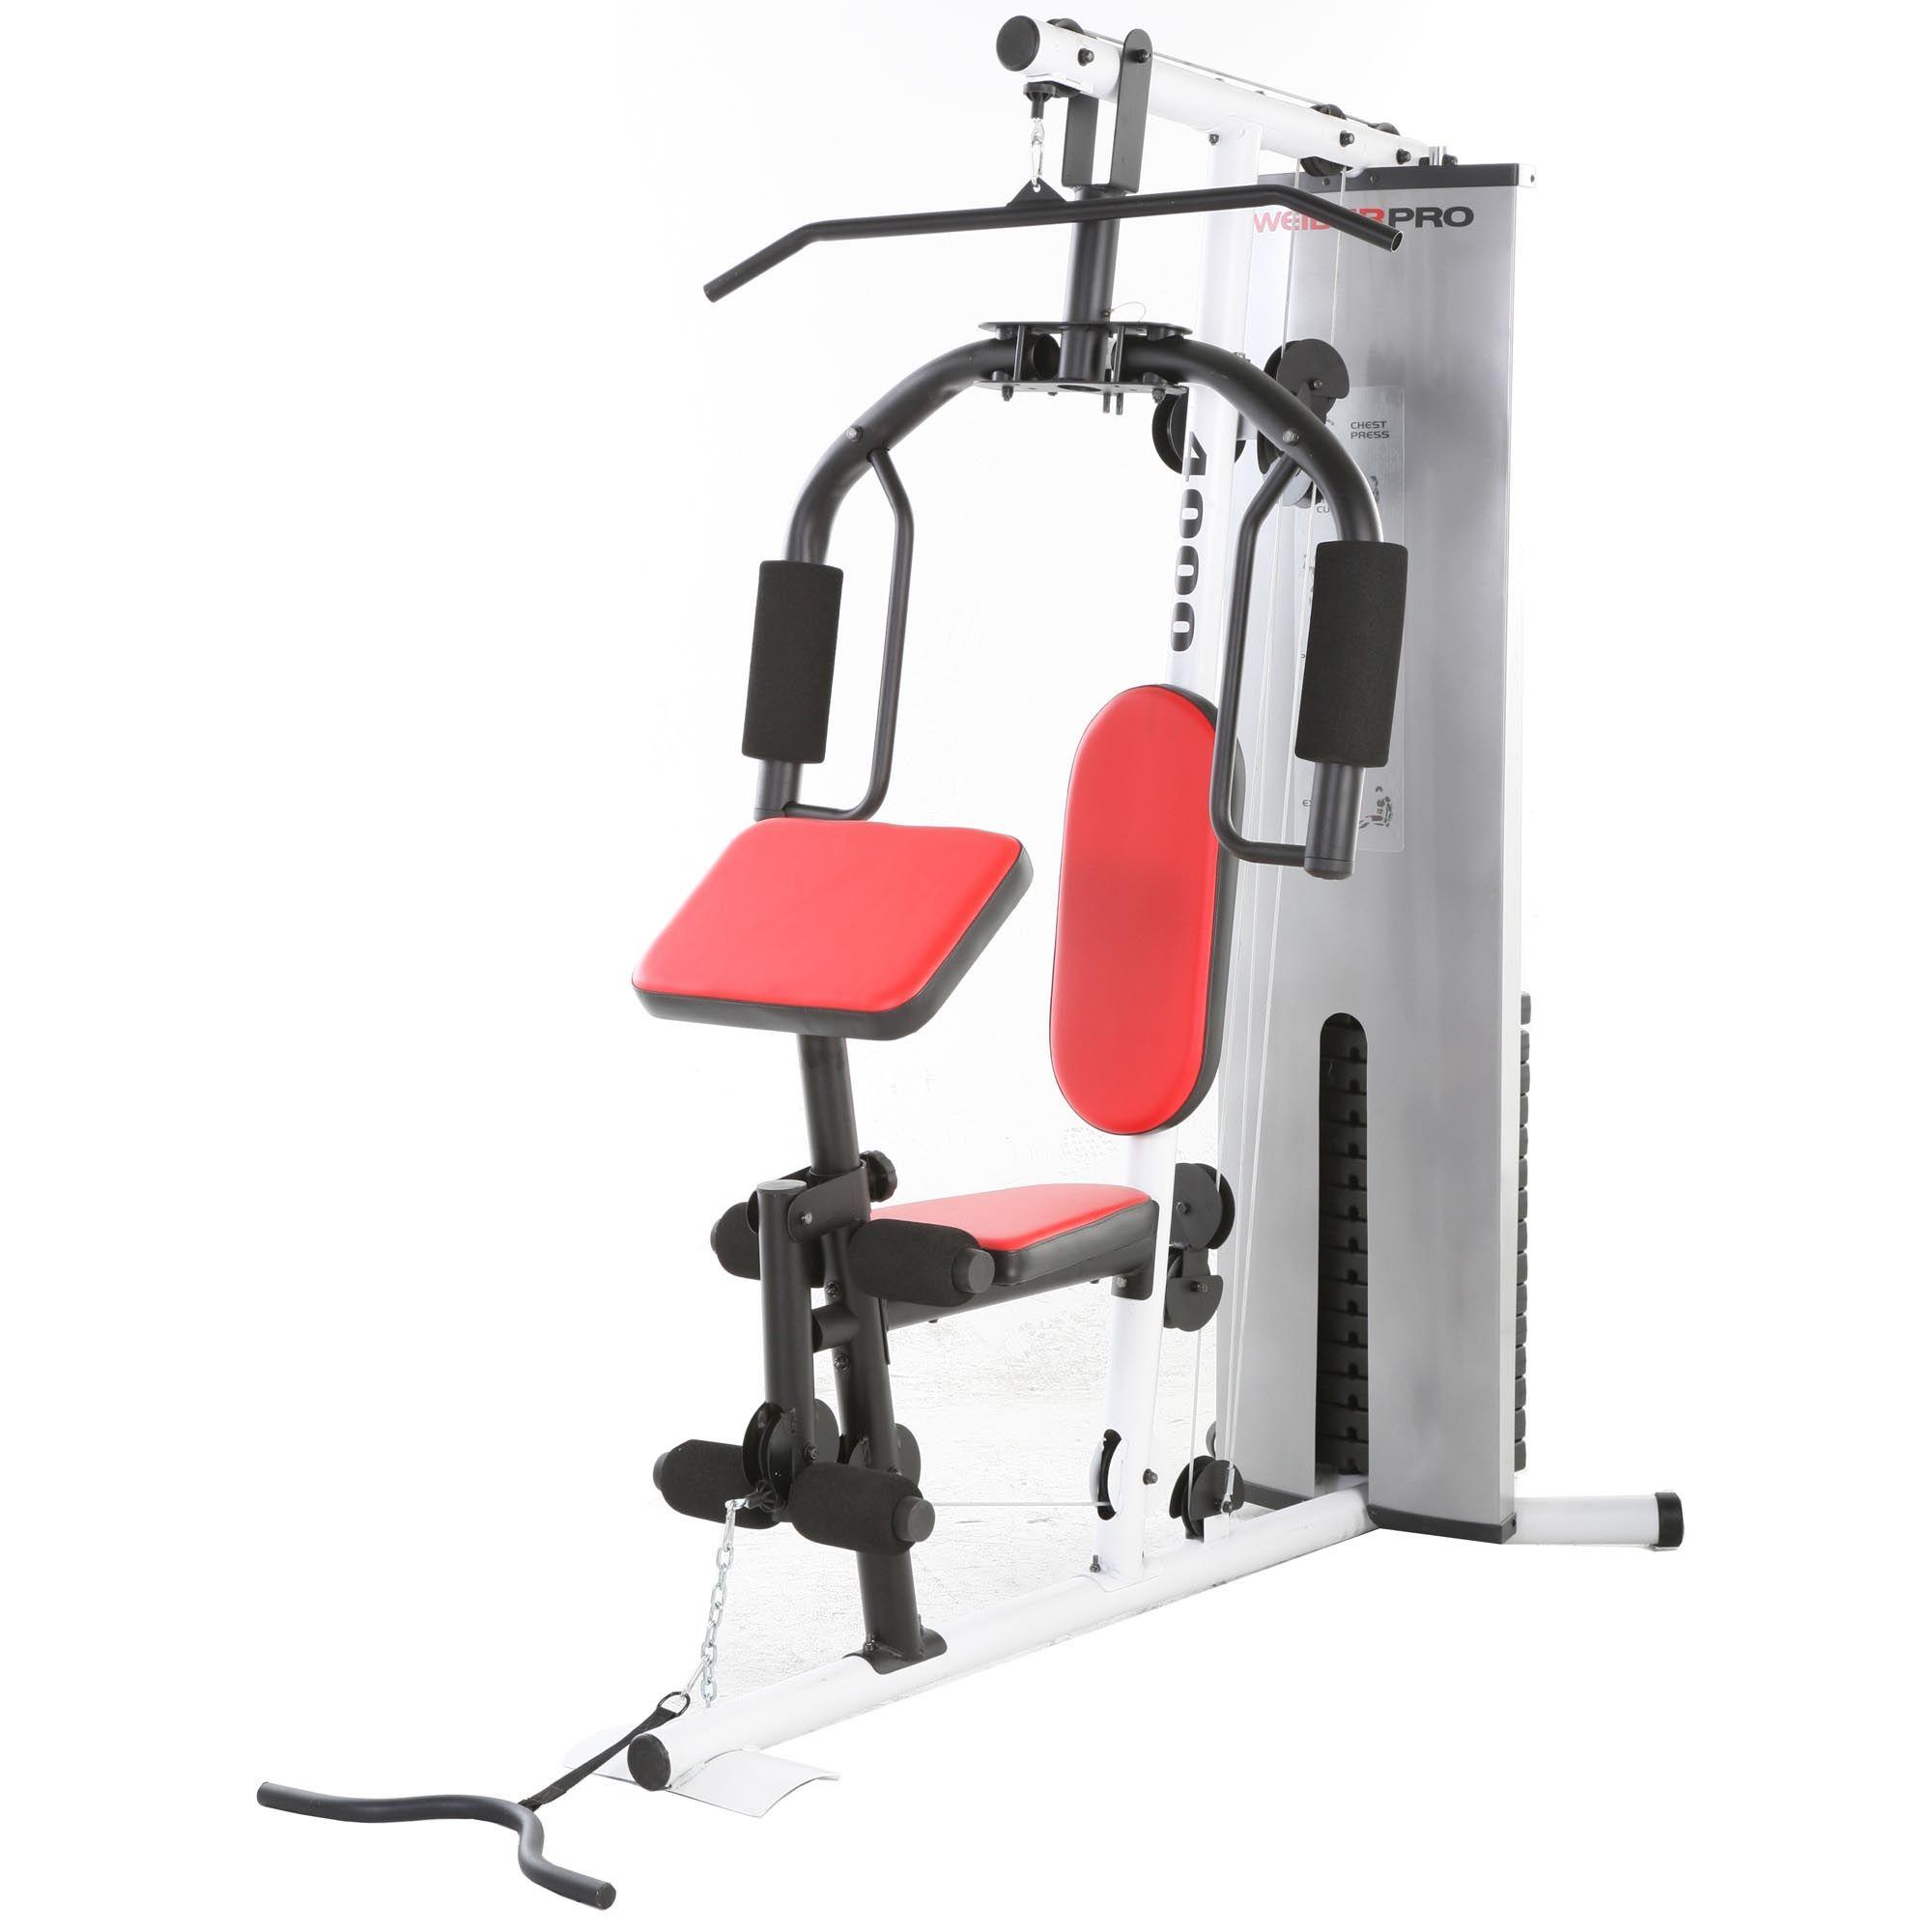 Weider Home Gym Instructions: Weider Pro 4000 Multi Gym